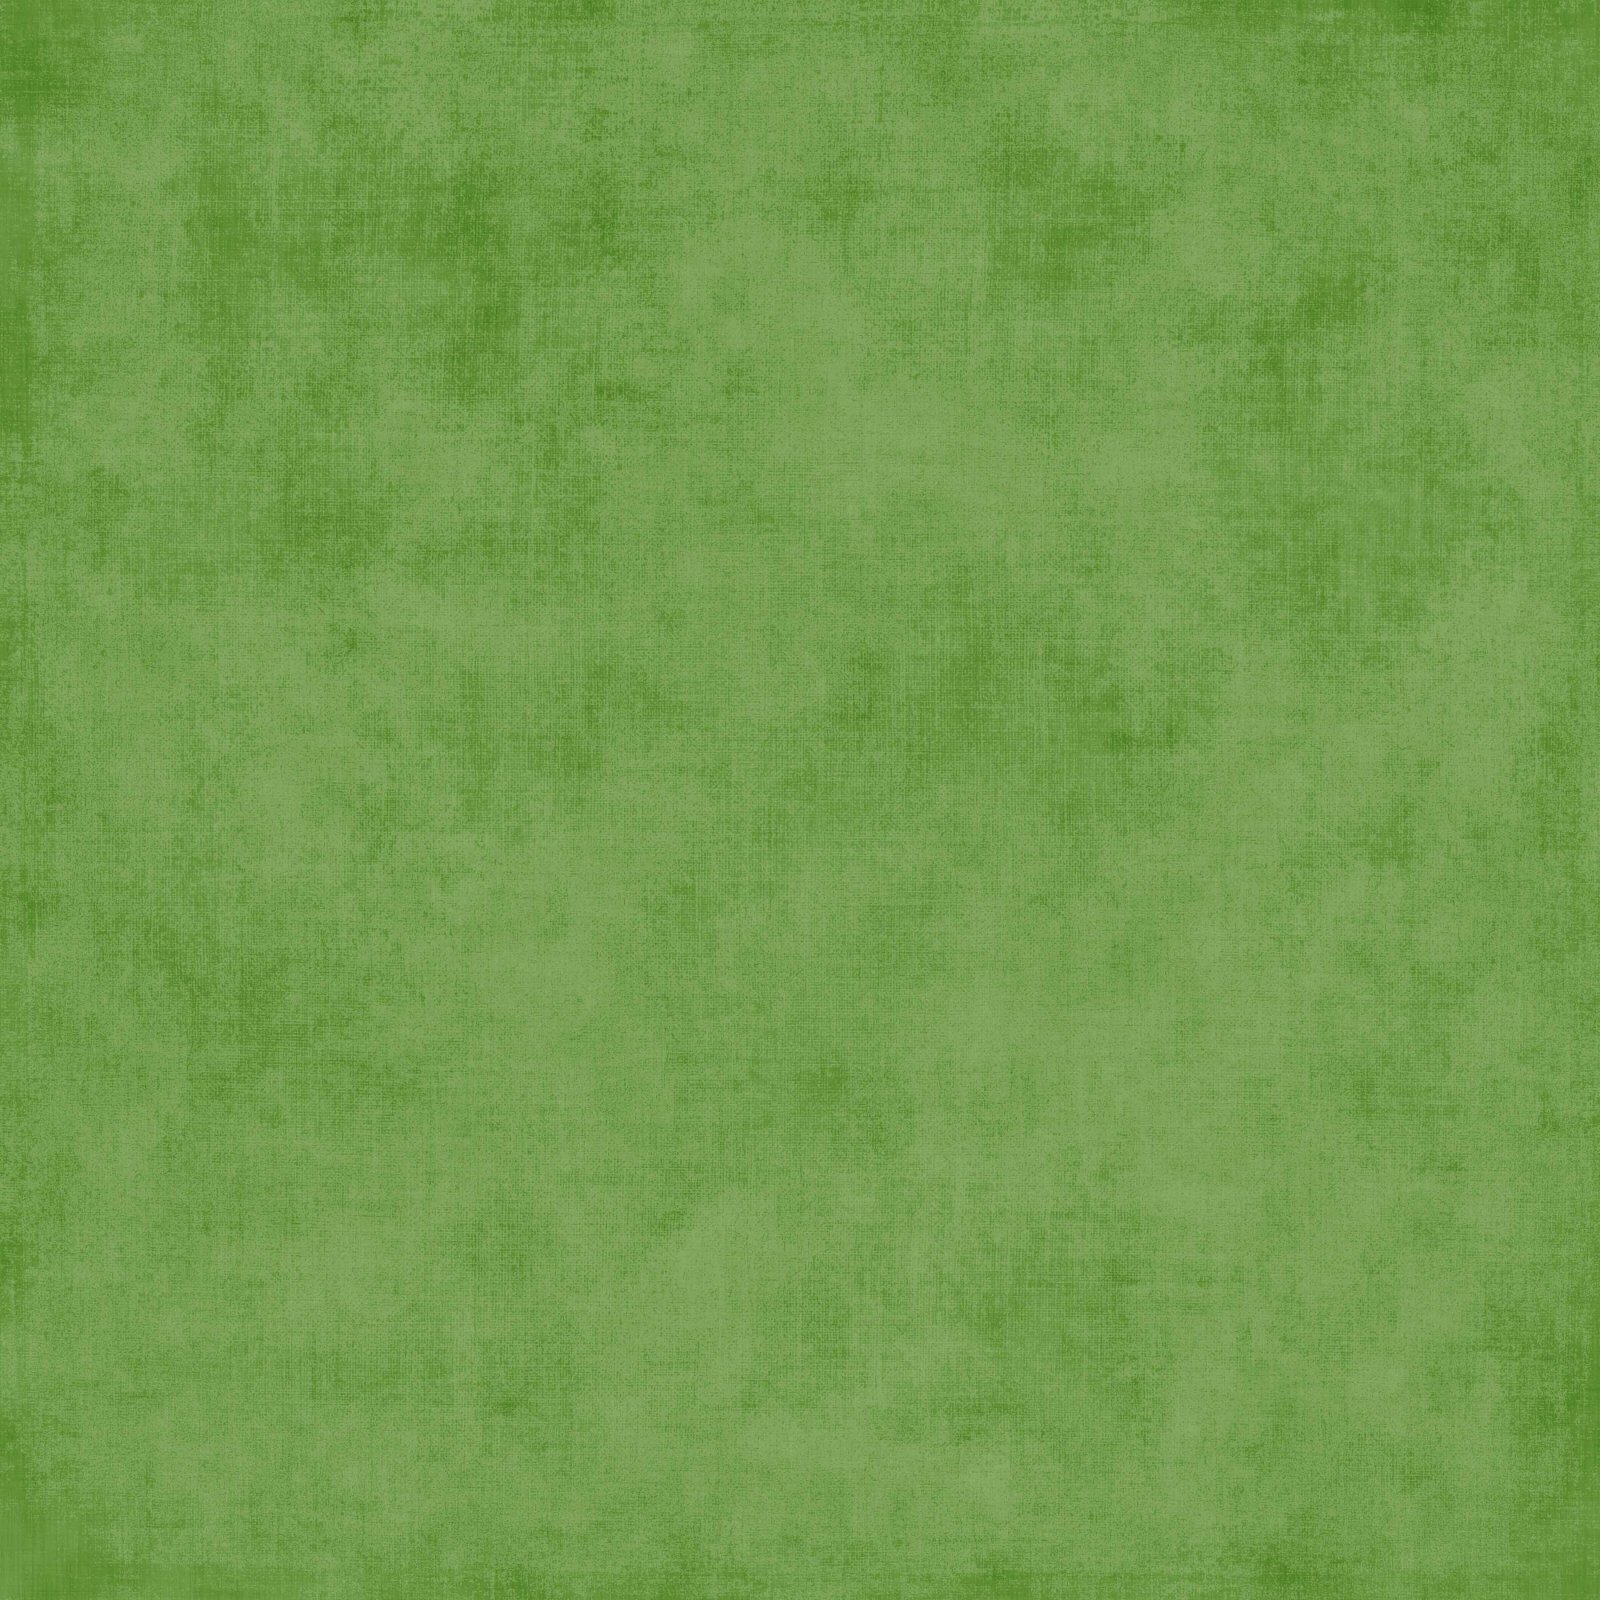 Basic Shade - Christmas Green Fabric